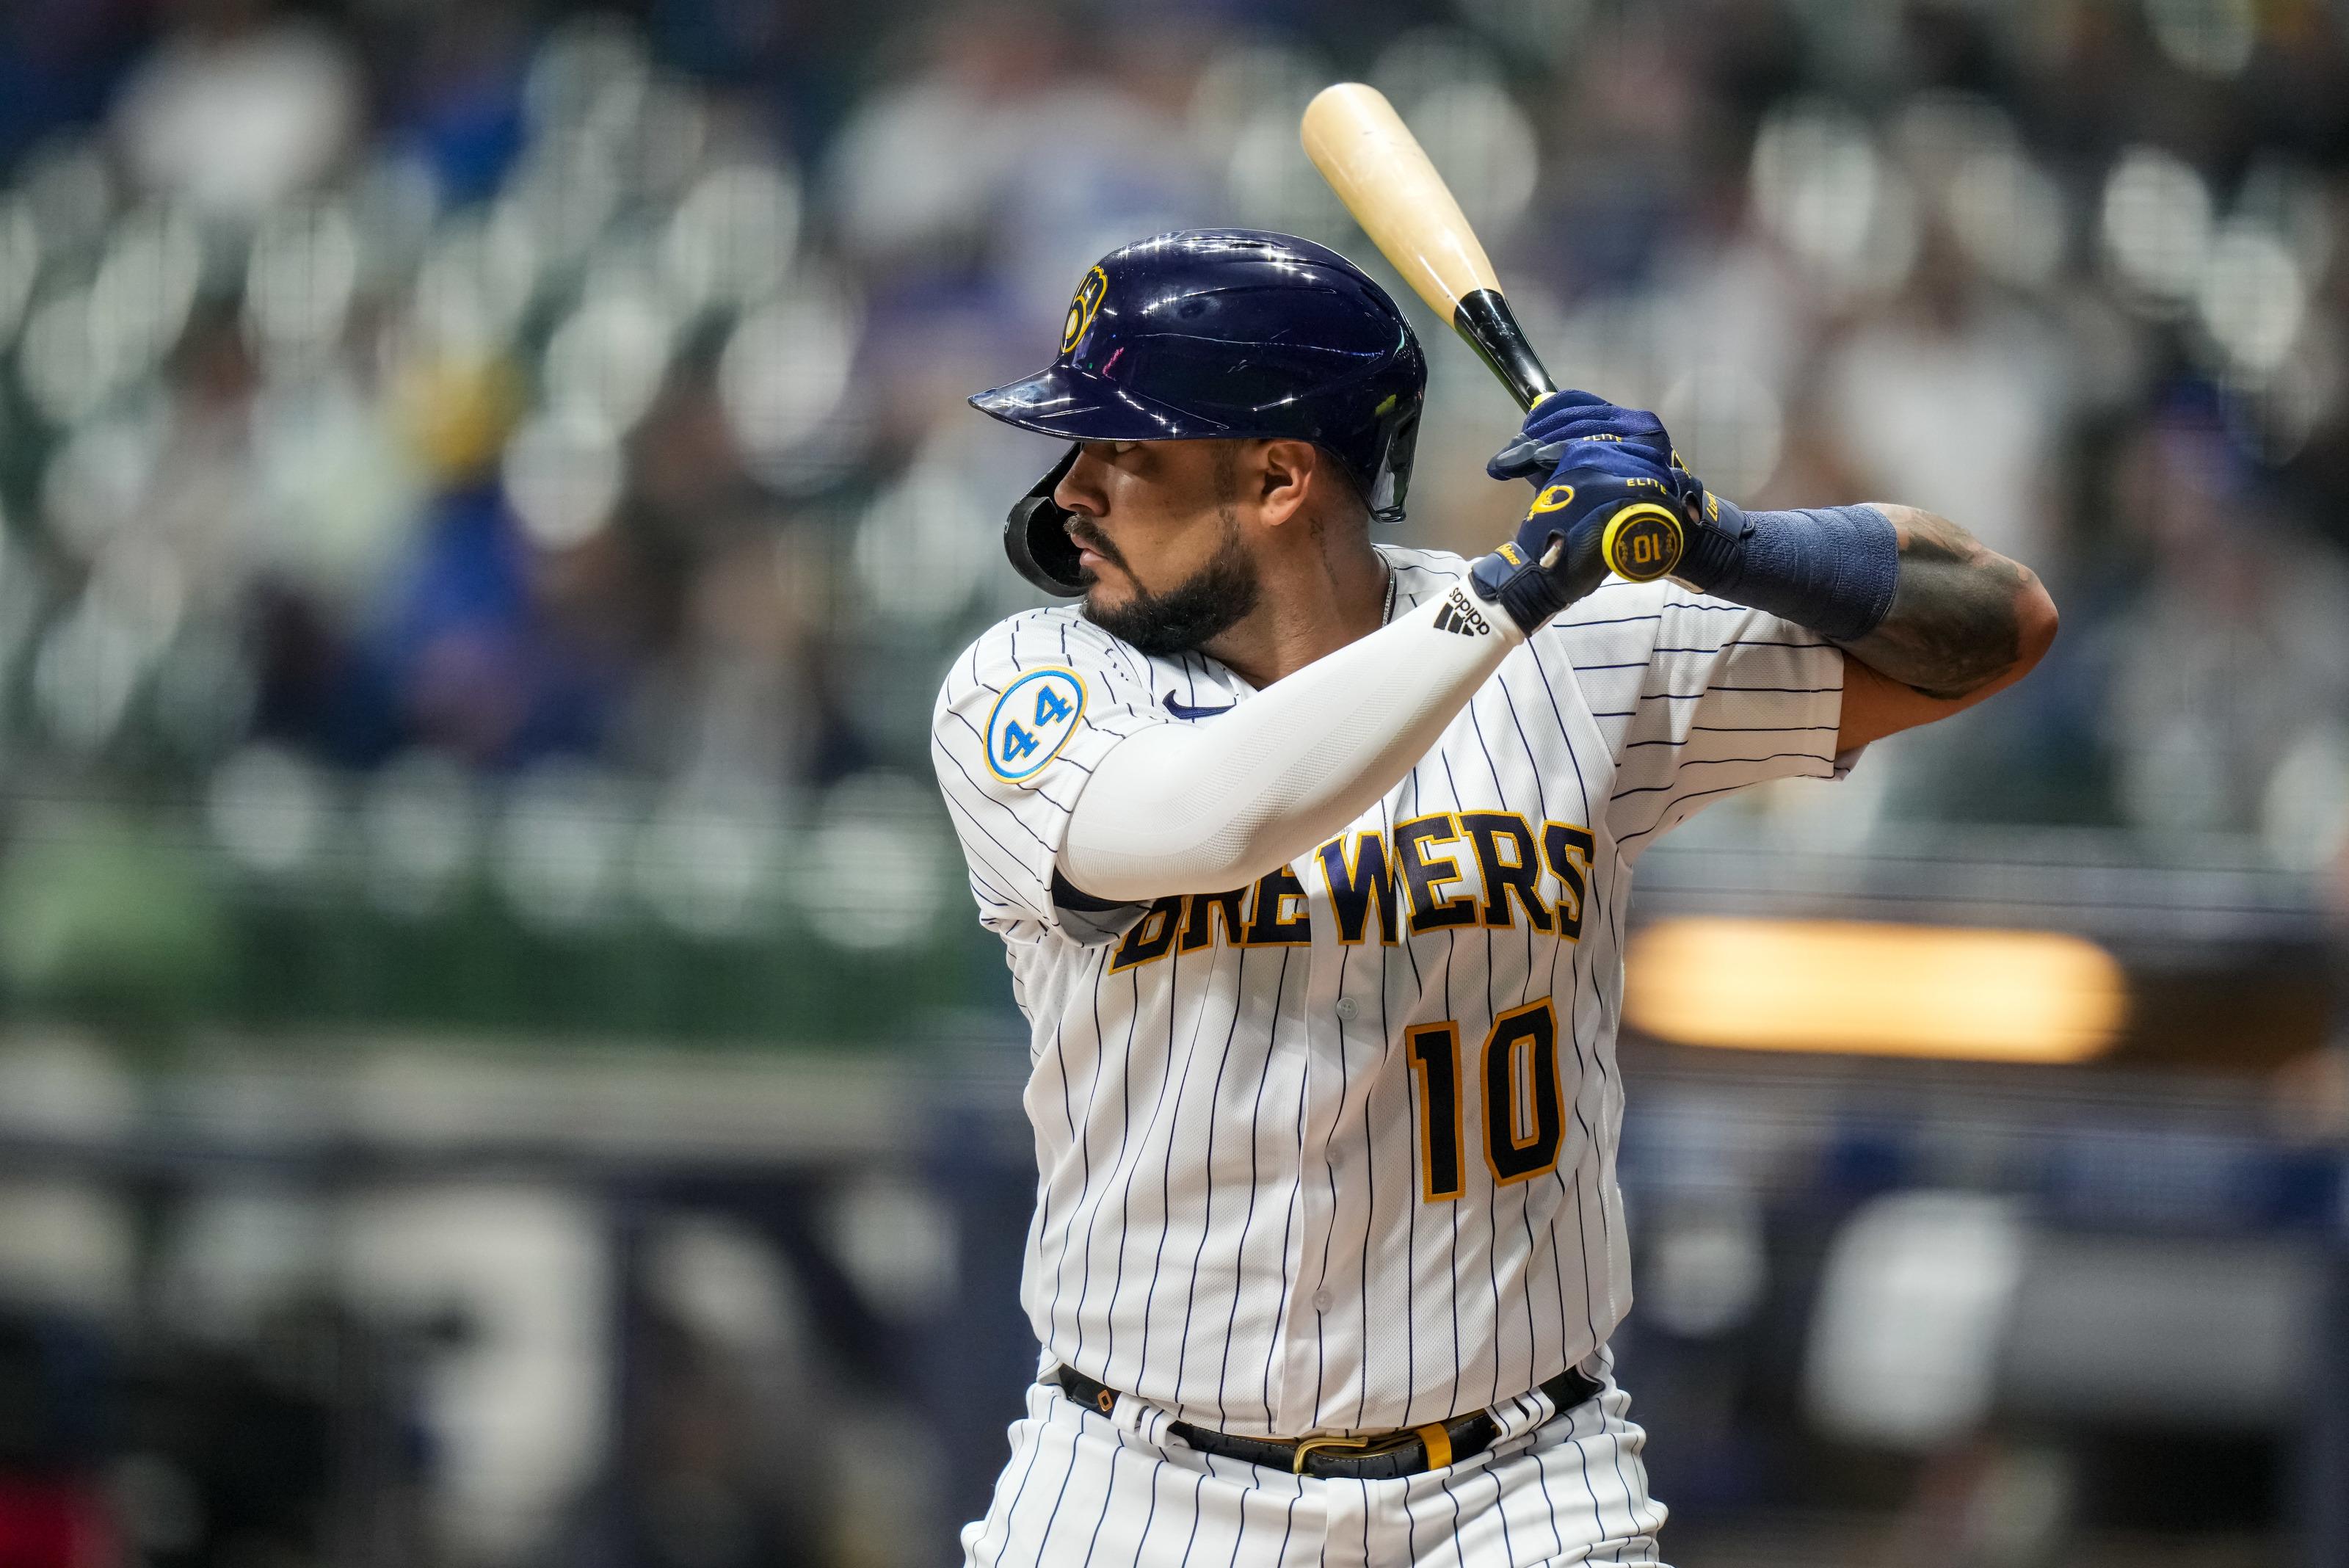 Brewers: Omar Narvaez Bright Spot in Milwaukee Lineup